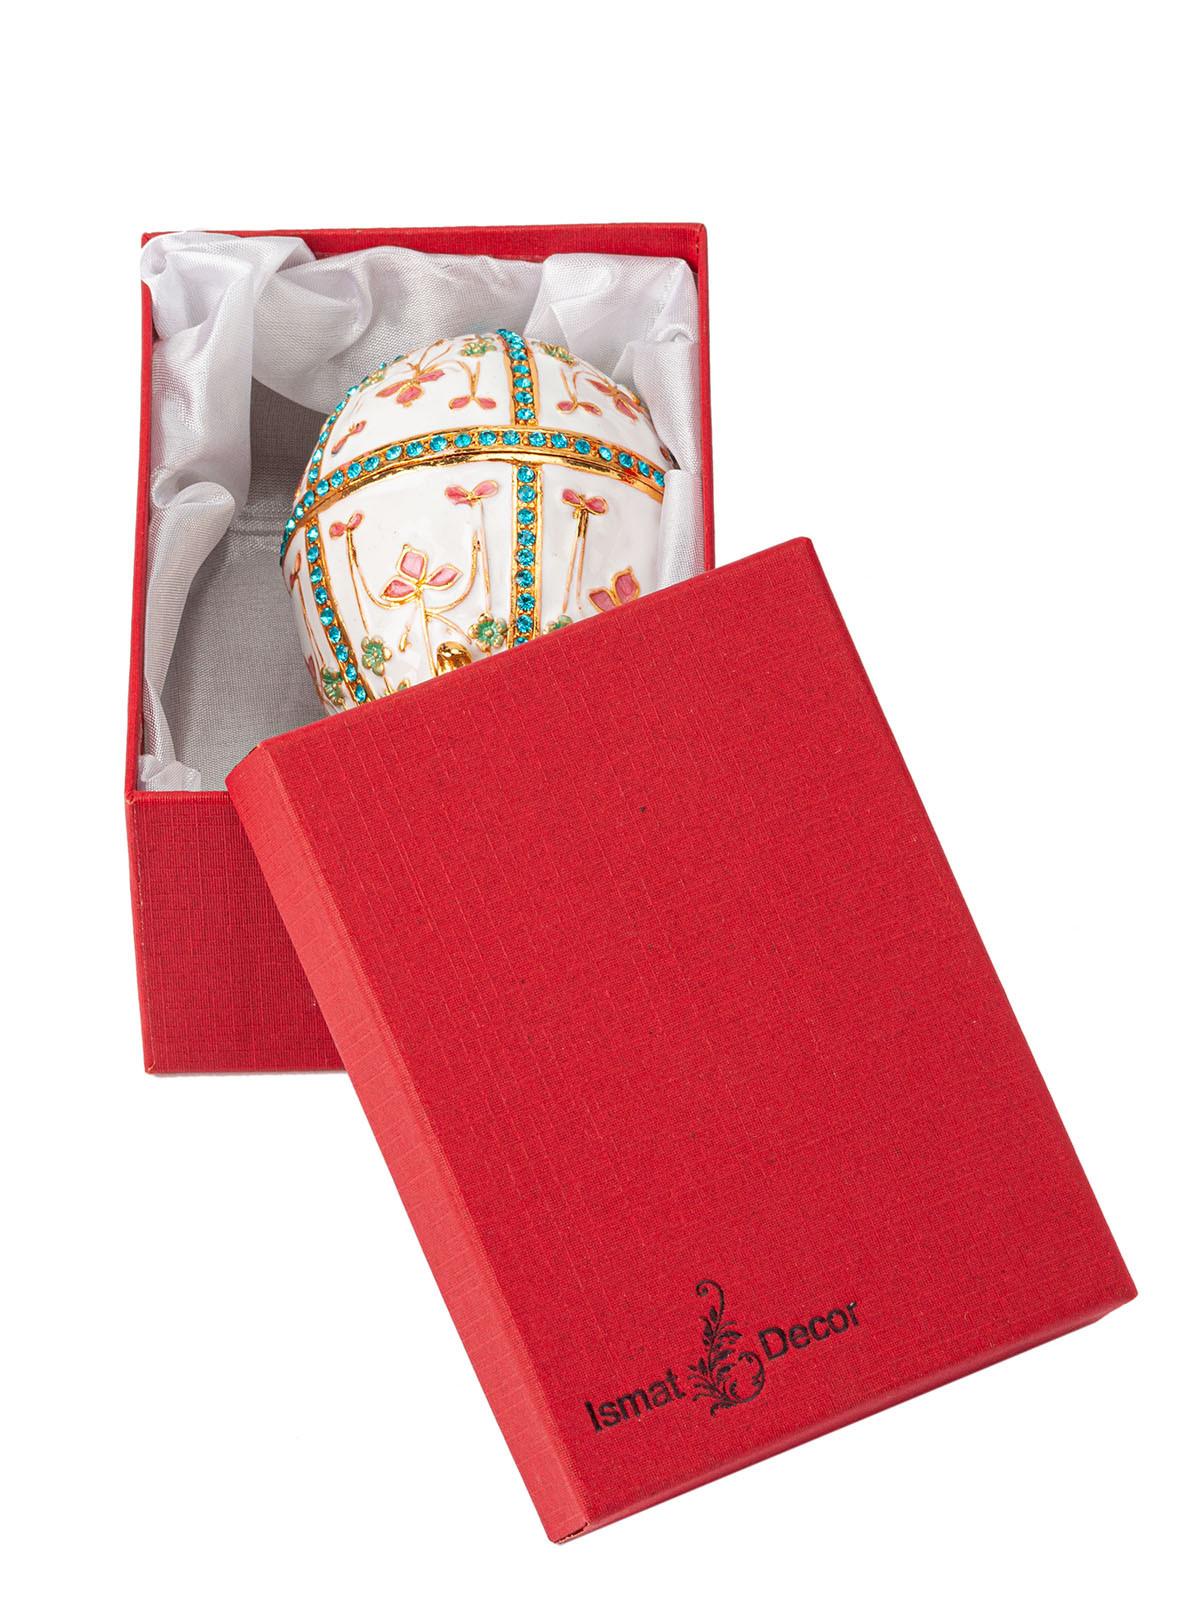 Шкатулка для украшений Яйцо Фаберже S-3313 белый